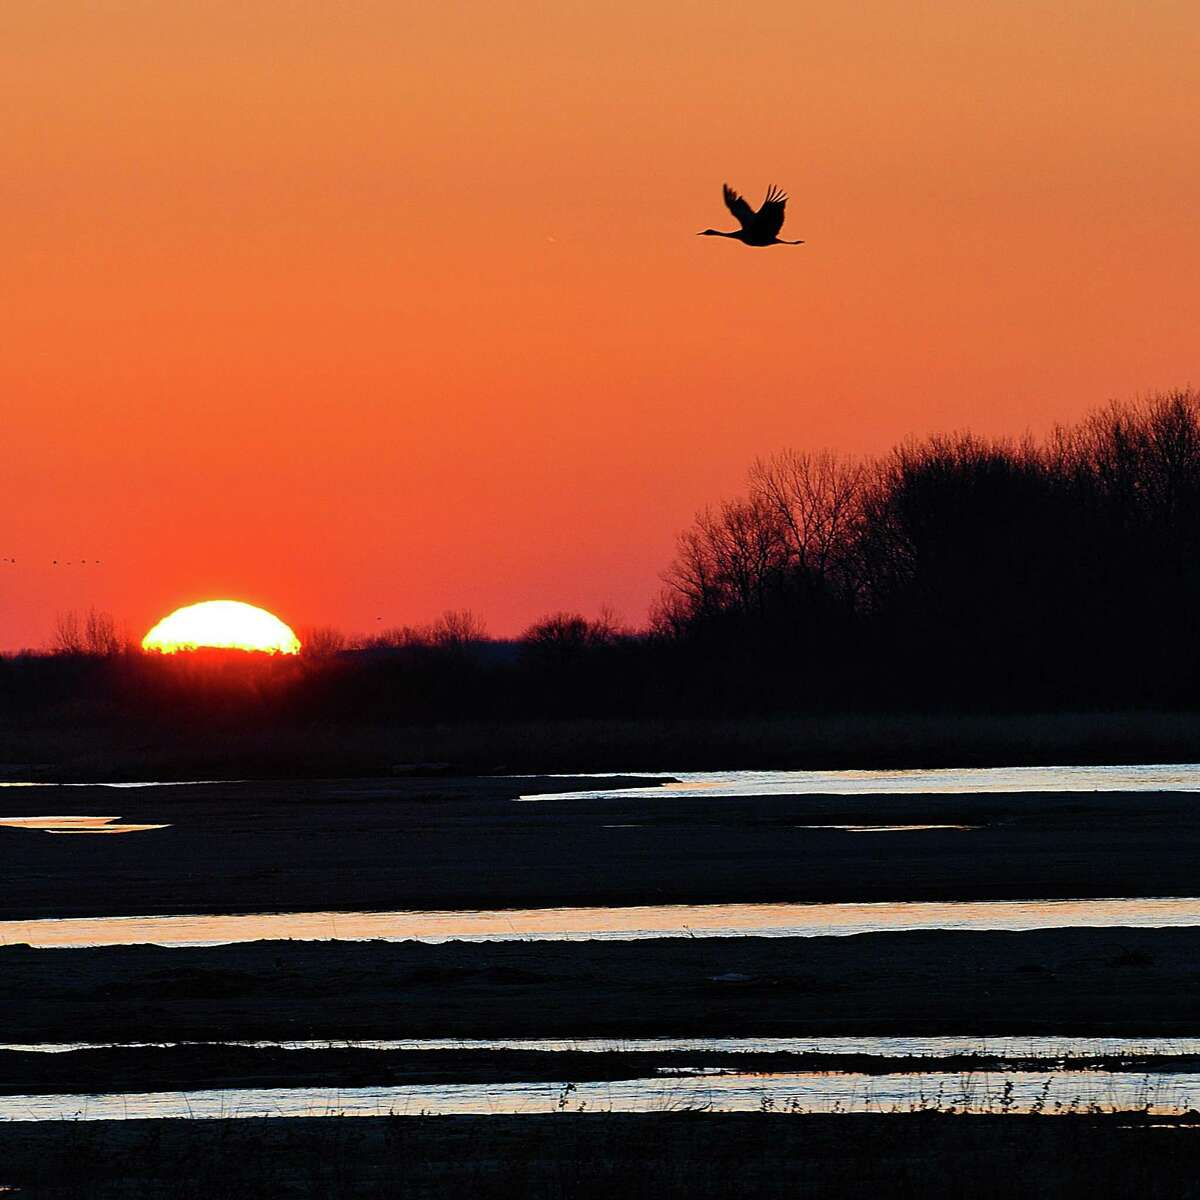 A sandhill crane at sunrise in Nebraska